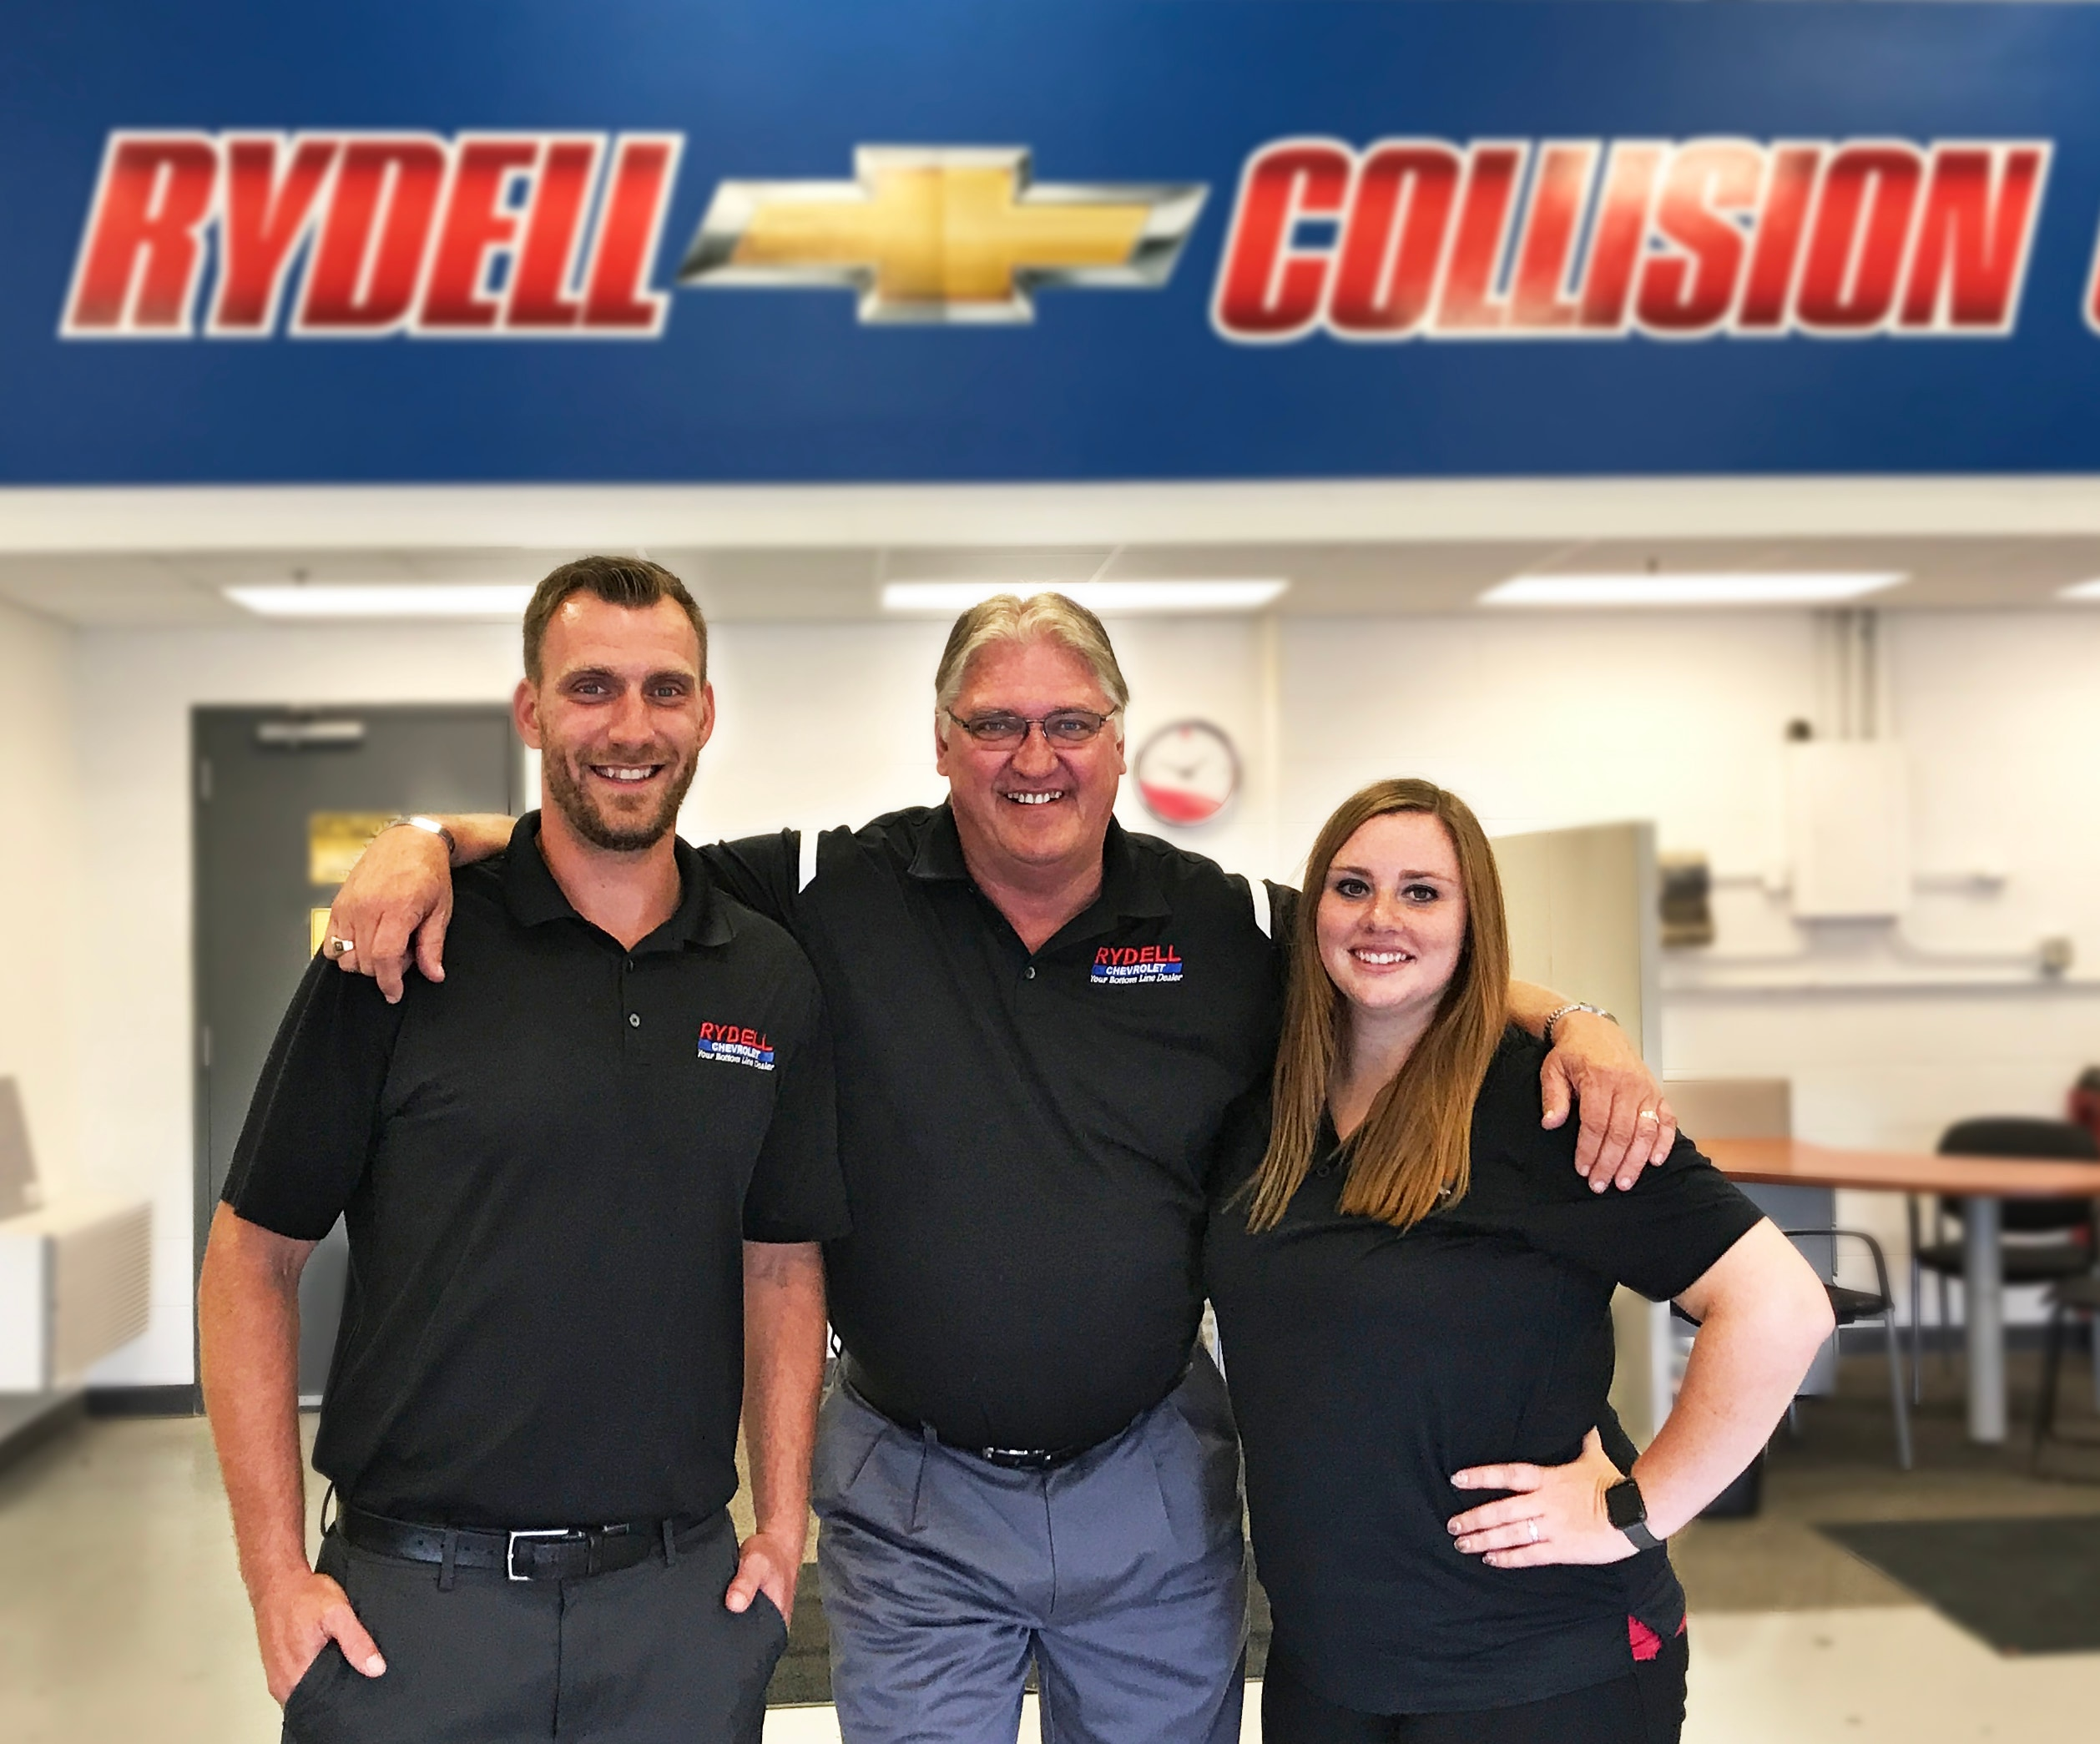 Delightful Rydell Chevrolet